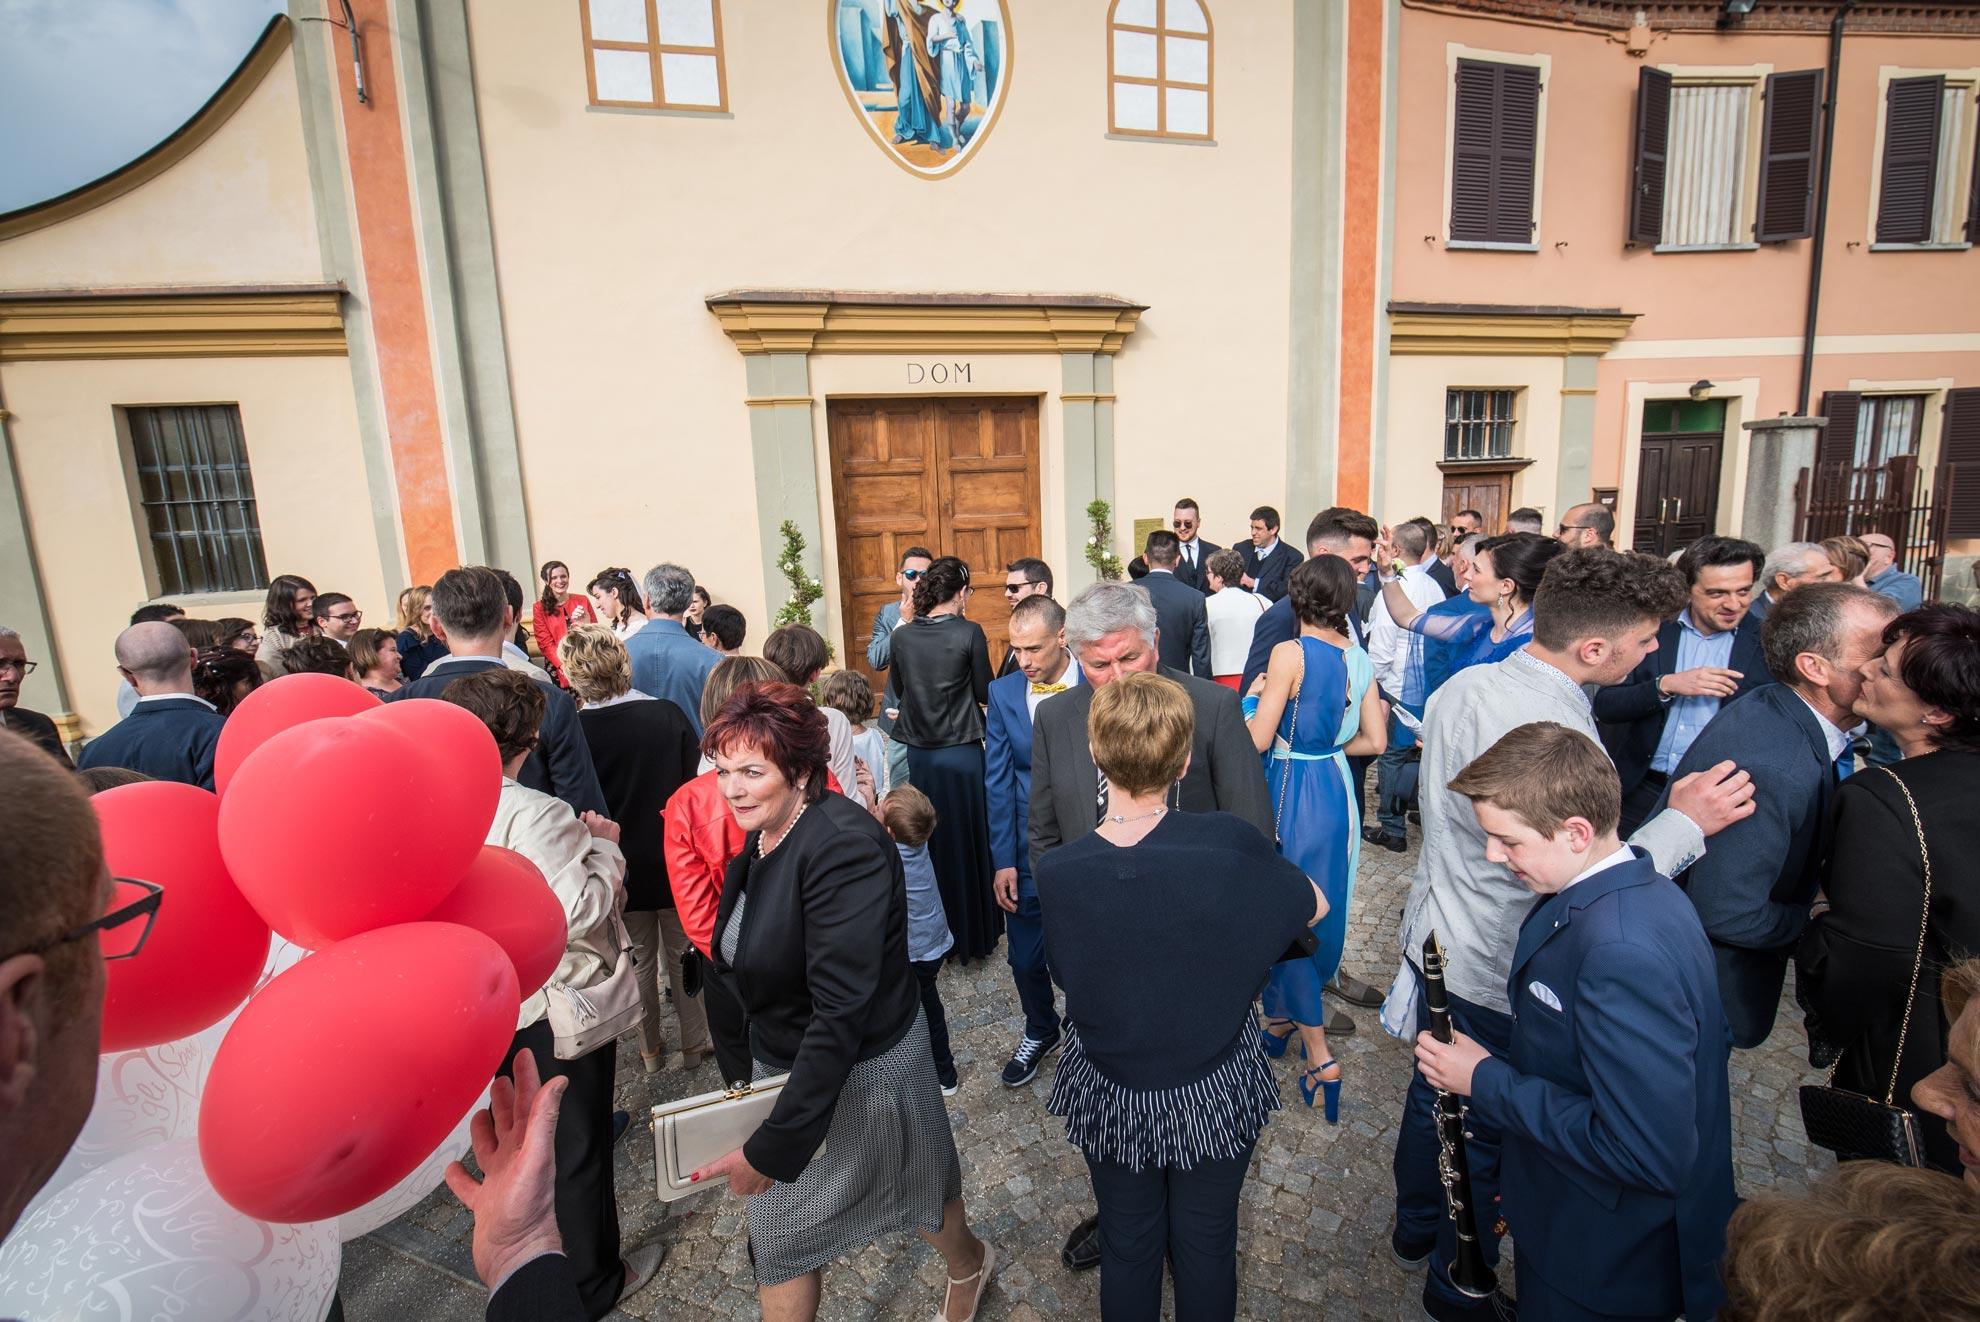 Matrimonio a Narzole Lorenza Diego - DSC 0613 - Fotografo matrimonio in Piemonte - Fotografo matrimonio in Piemonte